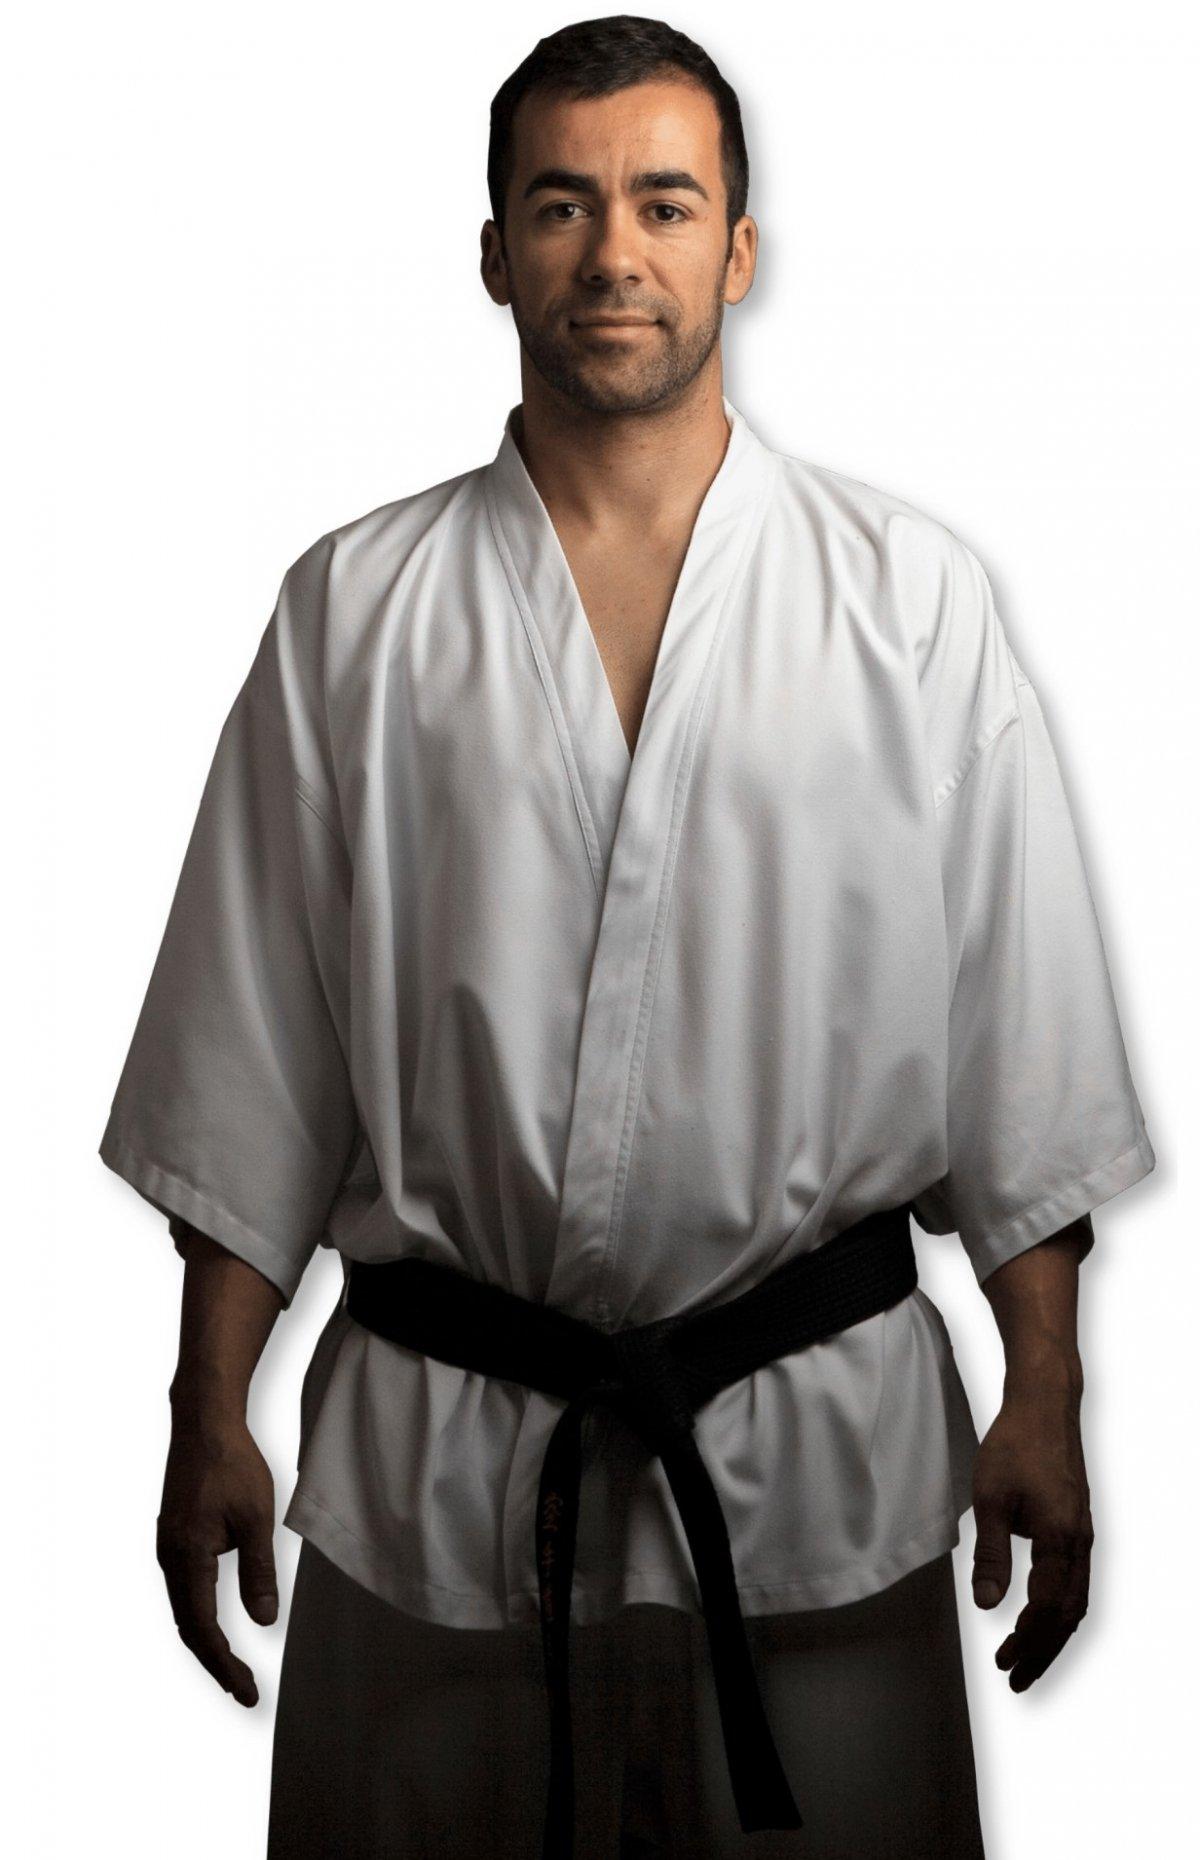 profesor de karate